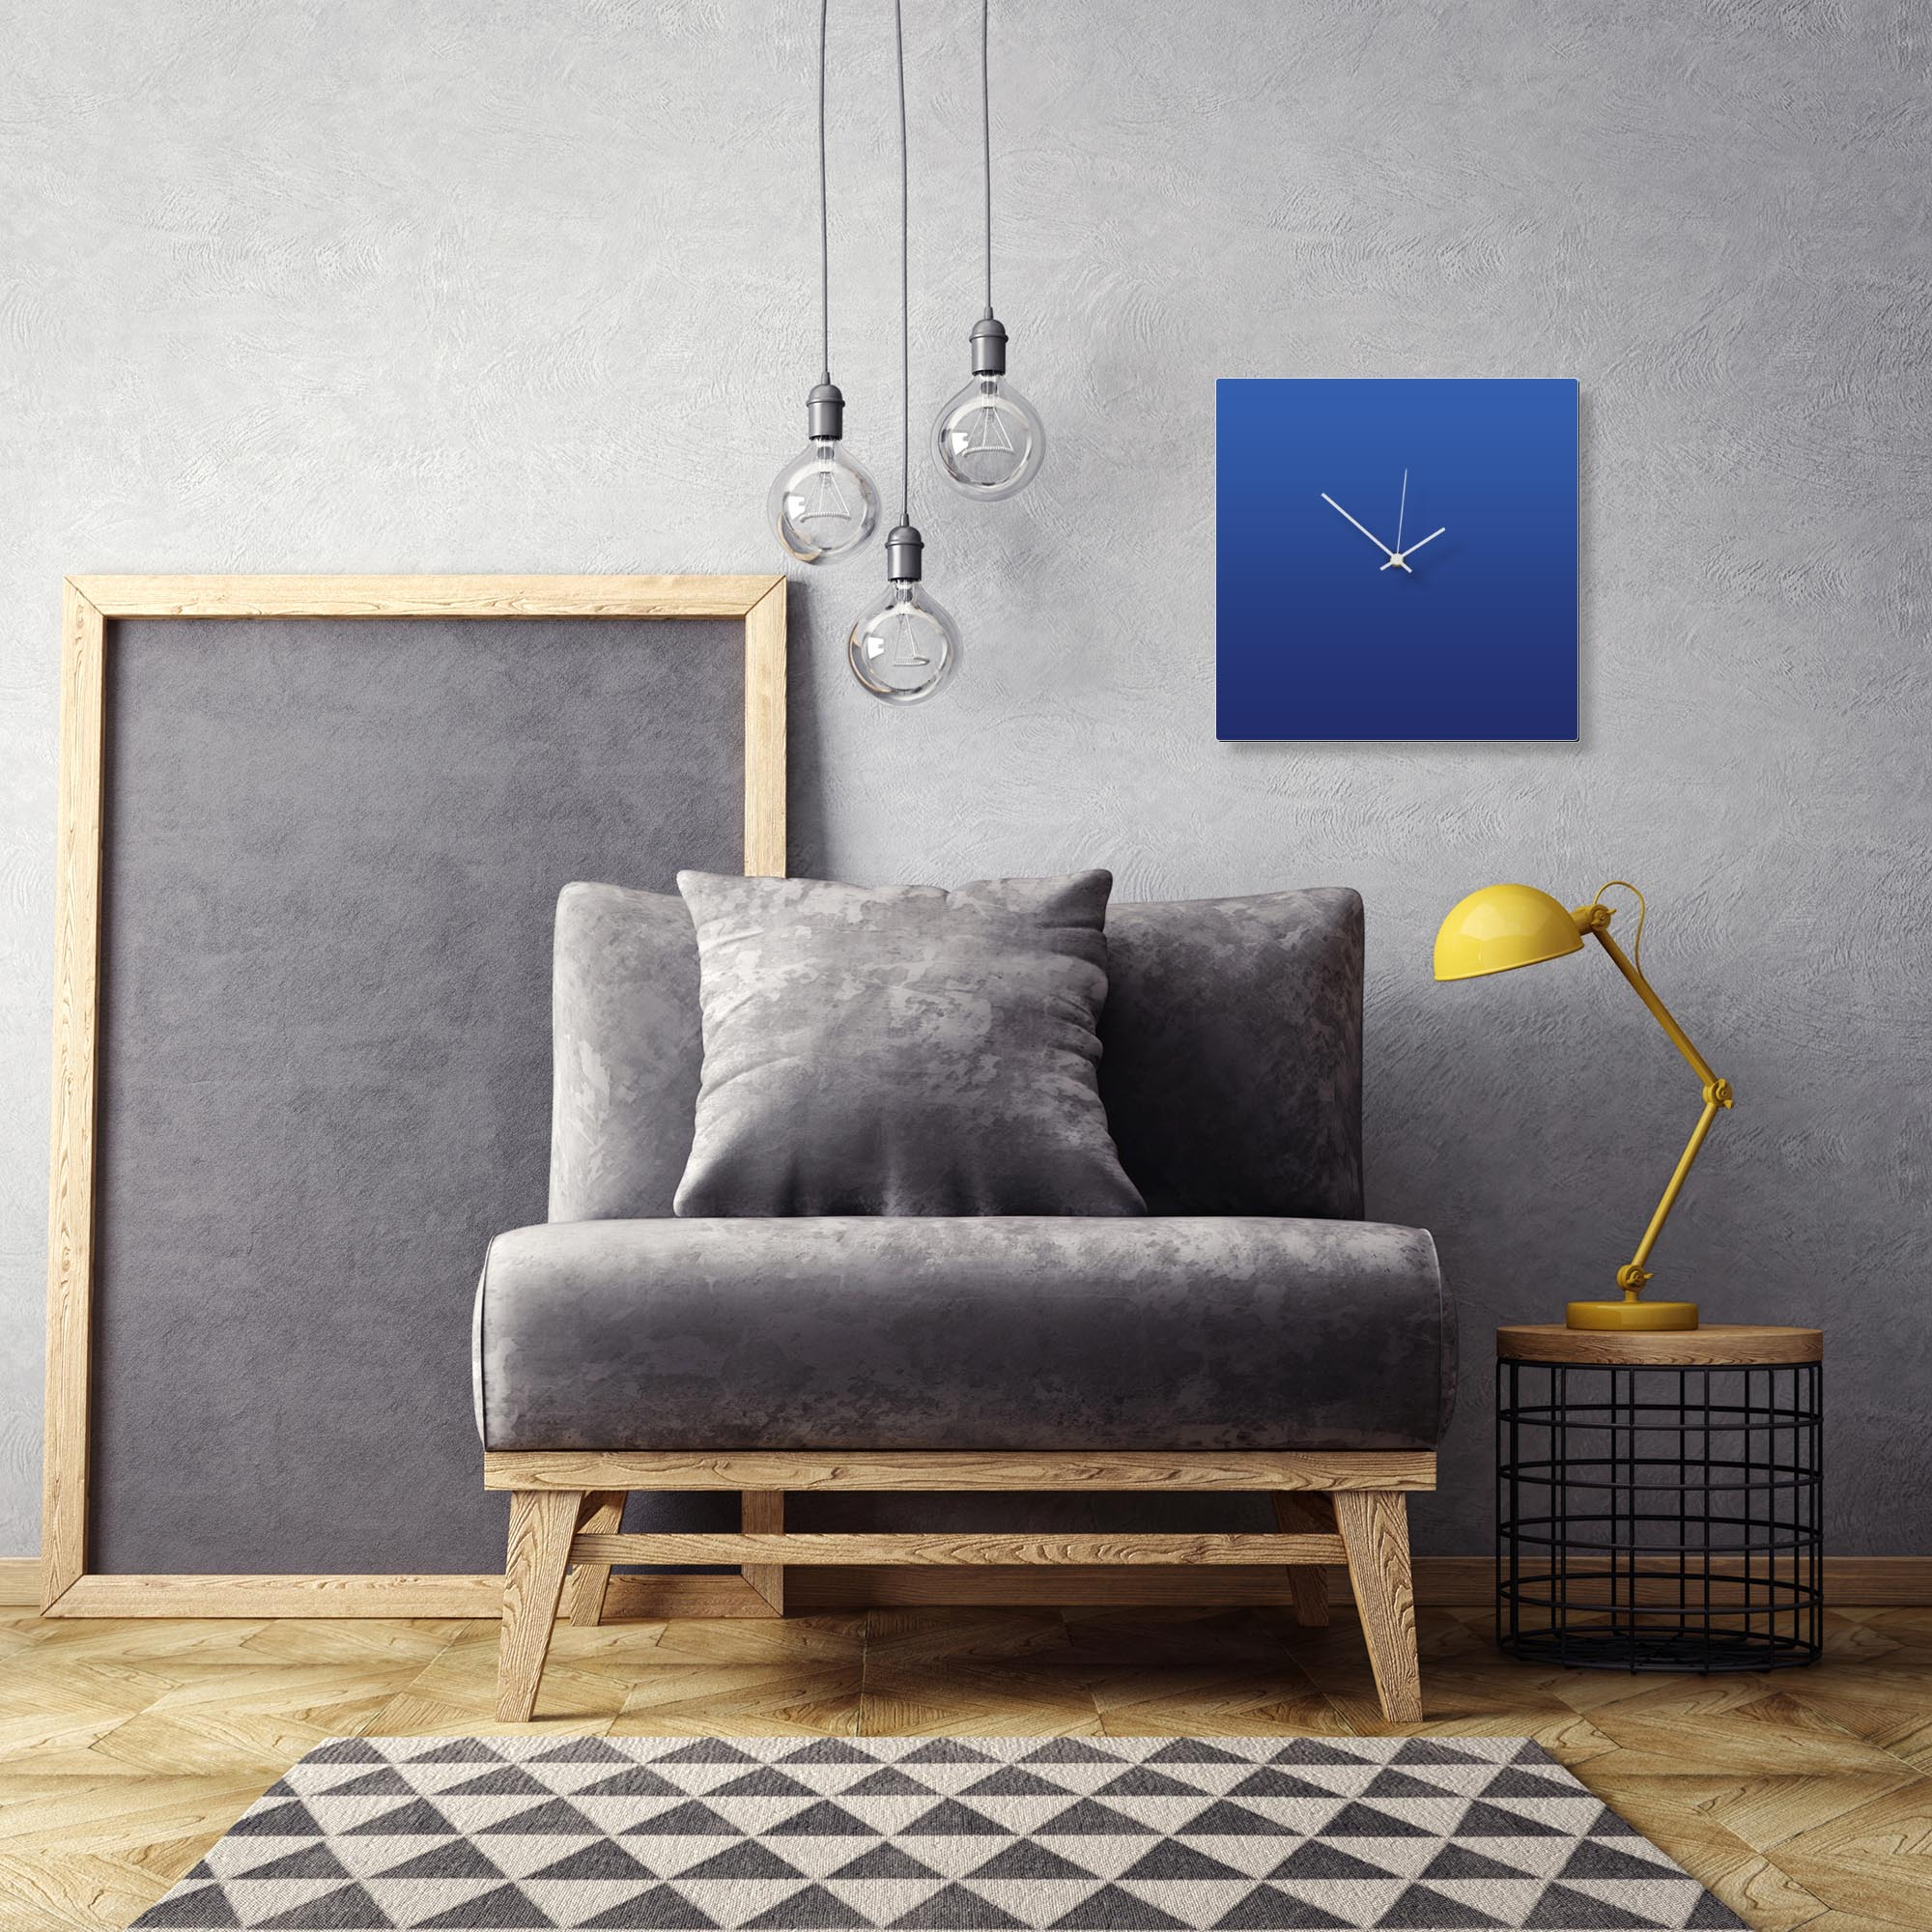 Blueout White Square Clock by Adam Schwoeppe Contemporary Clock on Aluminum Polymetal - Alternate View 1